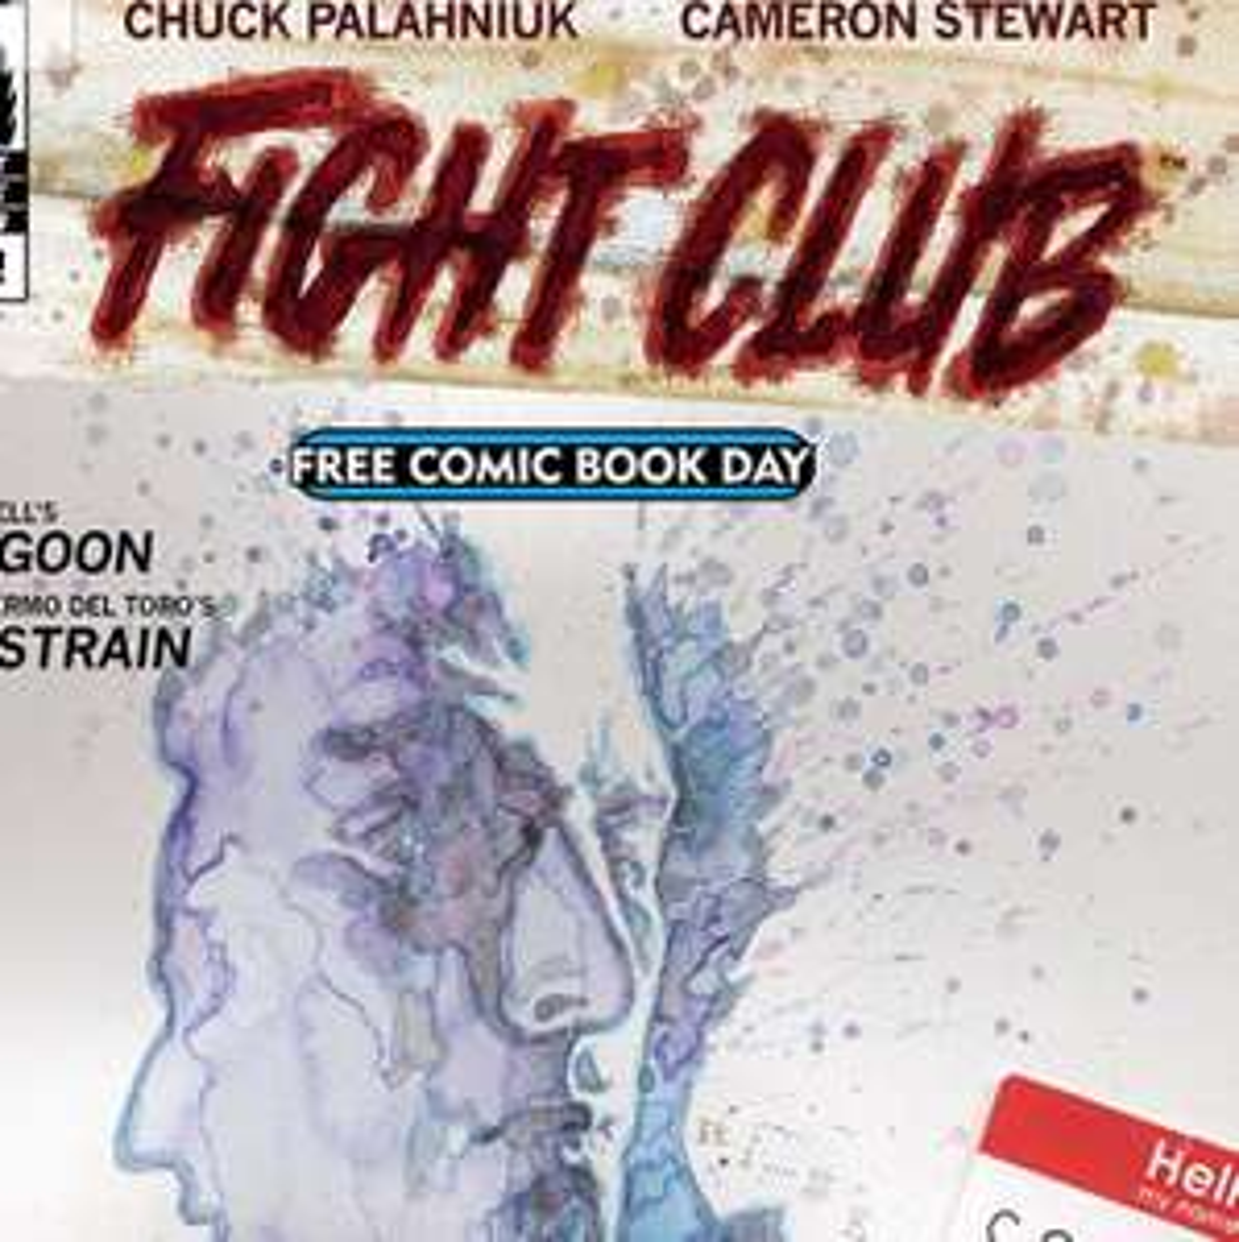 FREE DOWNLOAD. Fight Club - comic book (Dark Horse Comics) Amazon